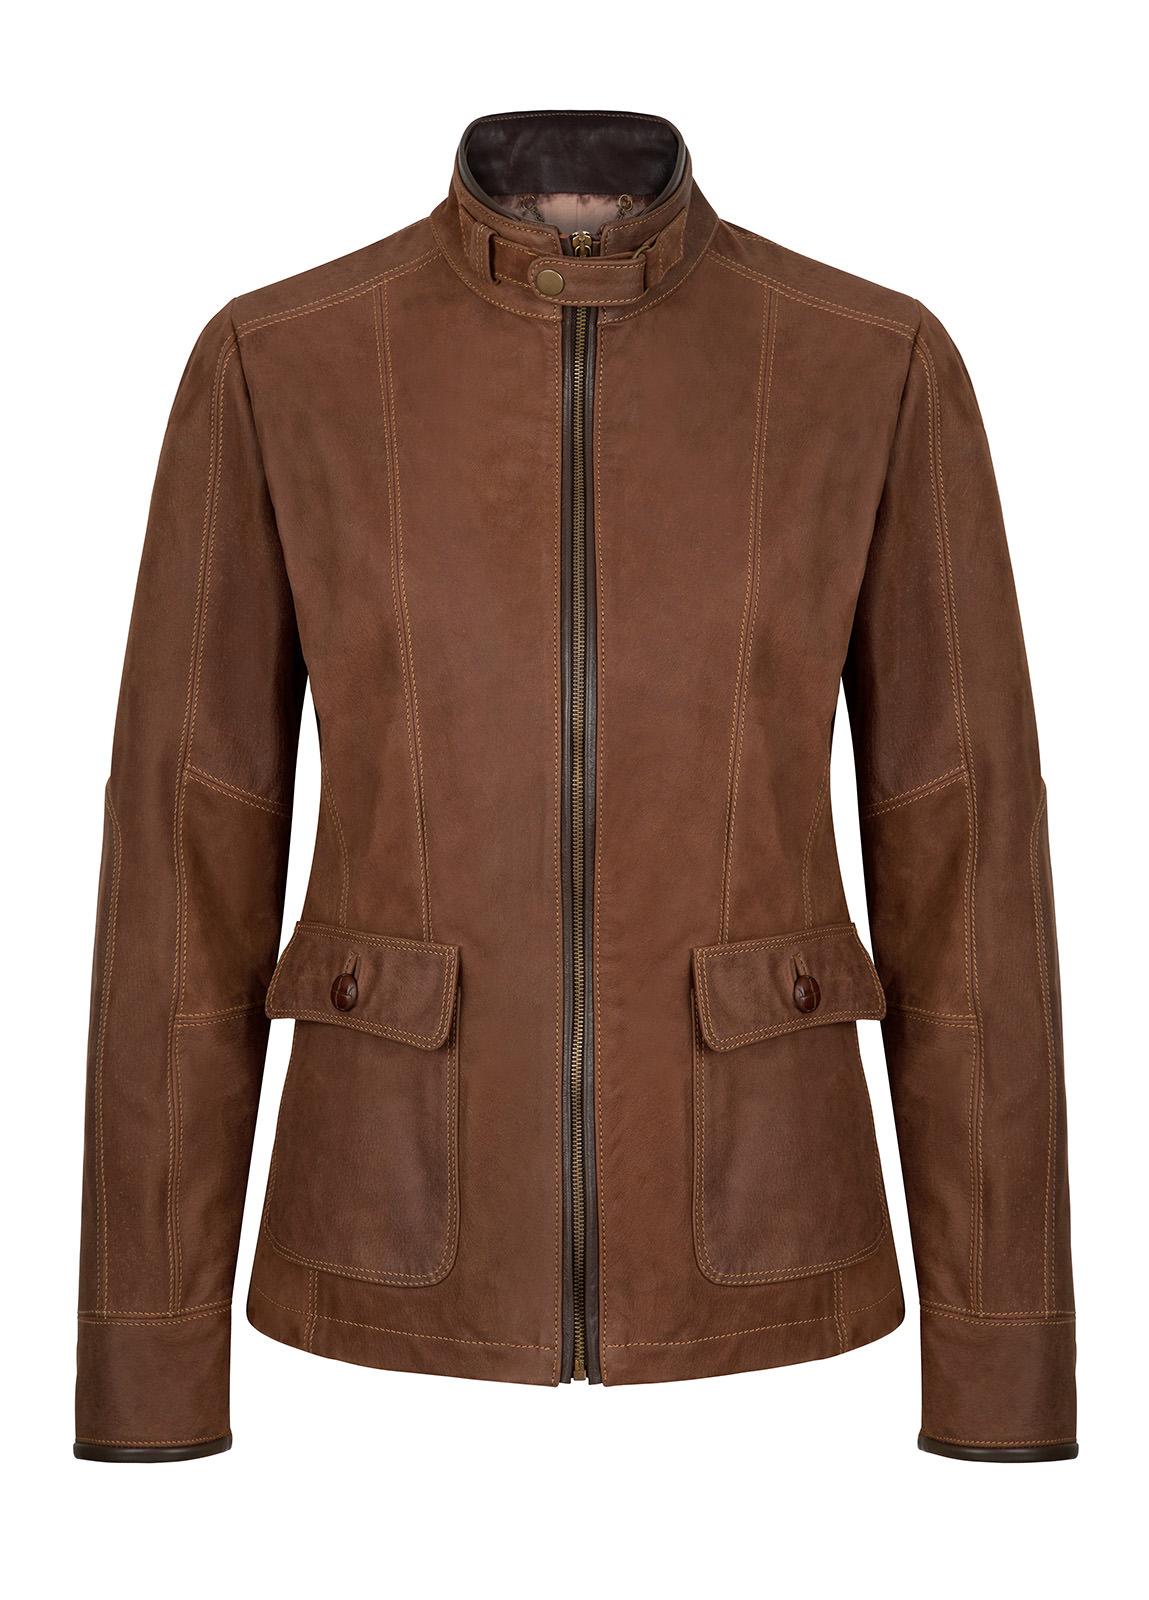 Dubarry_Mallow Leather Jacket. - Walnut_Image_2